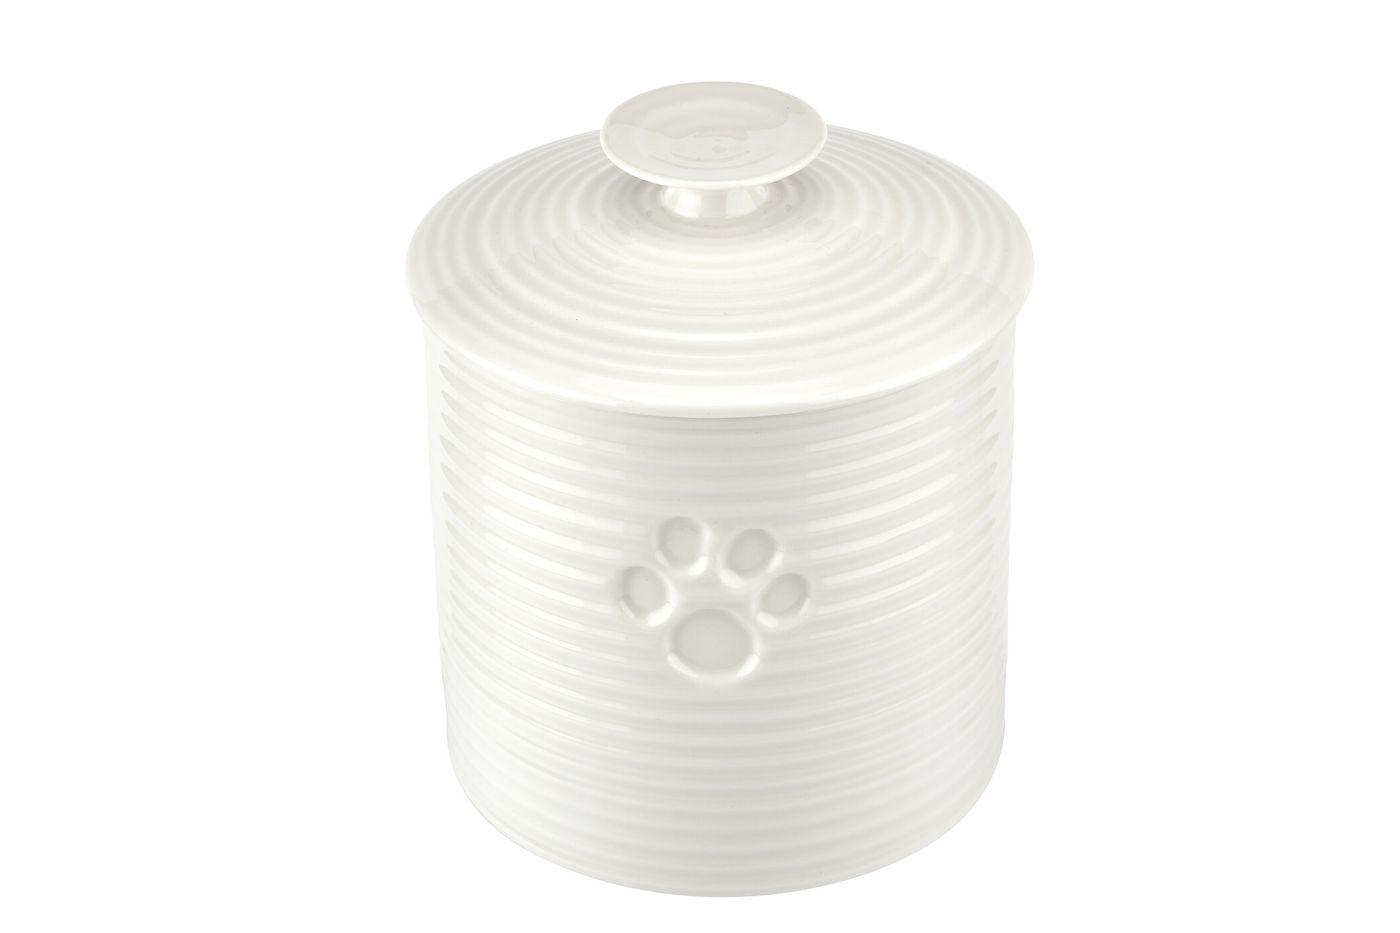 Sophie Conran for Portmeirion White Pet Treat Jar 16.5cm thumb 2